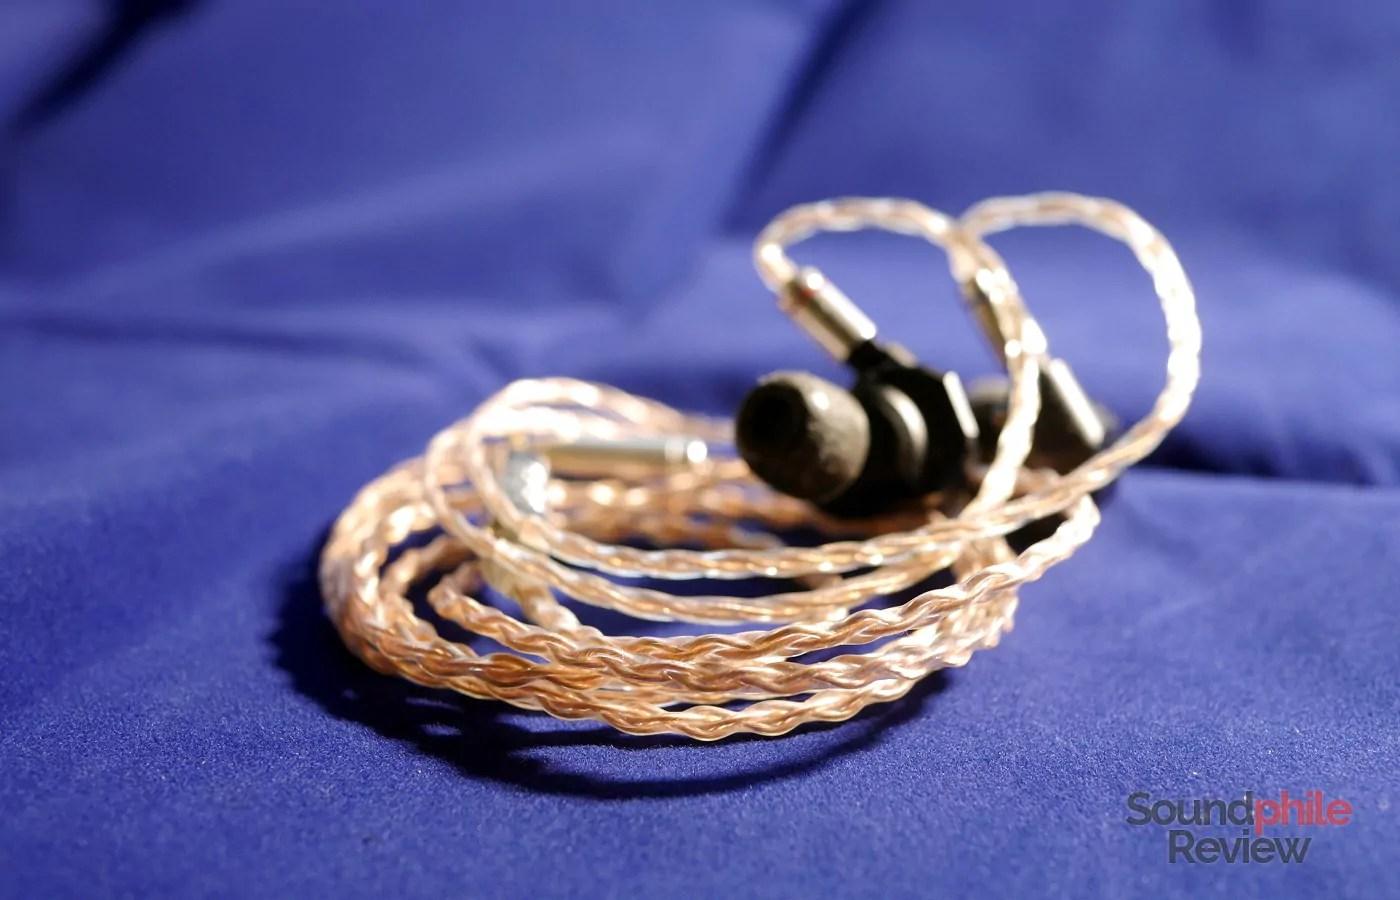 AK Audio 4-Core 7N copper cable review